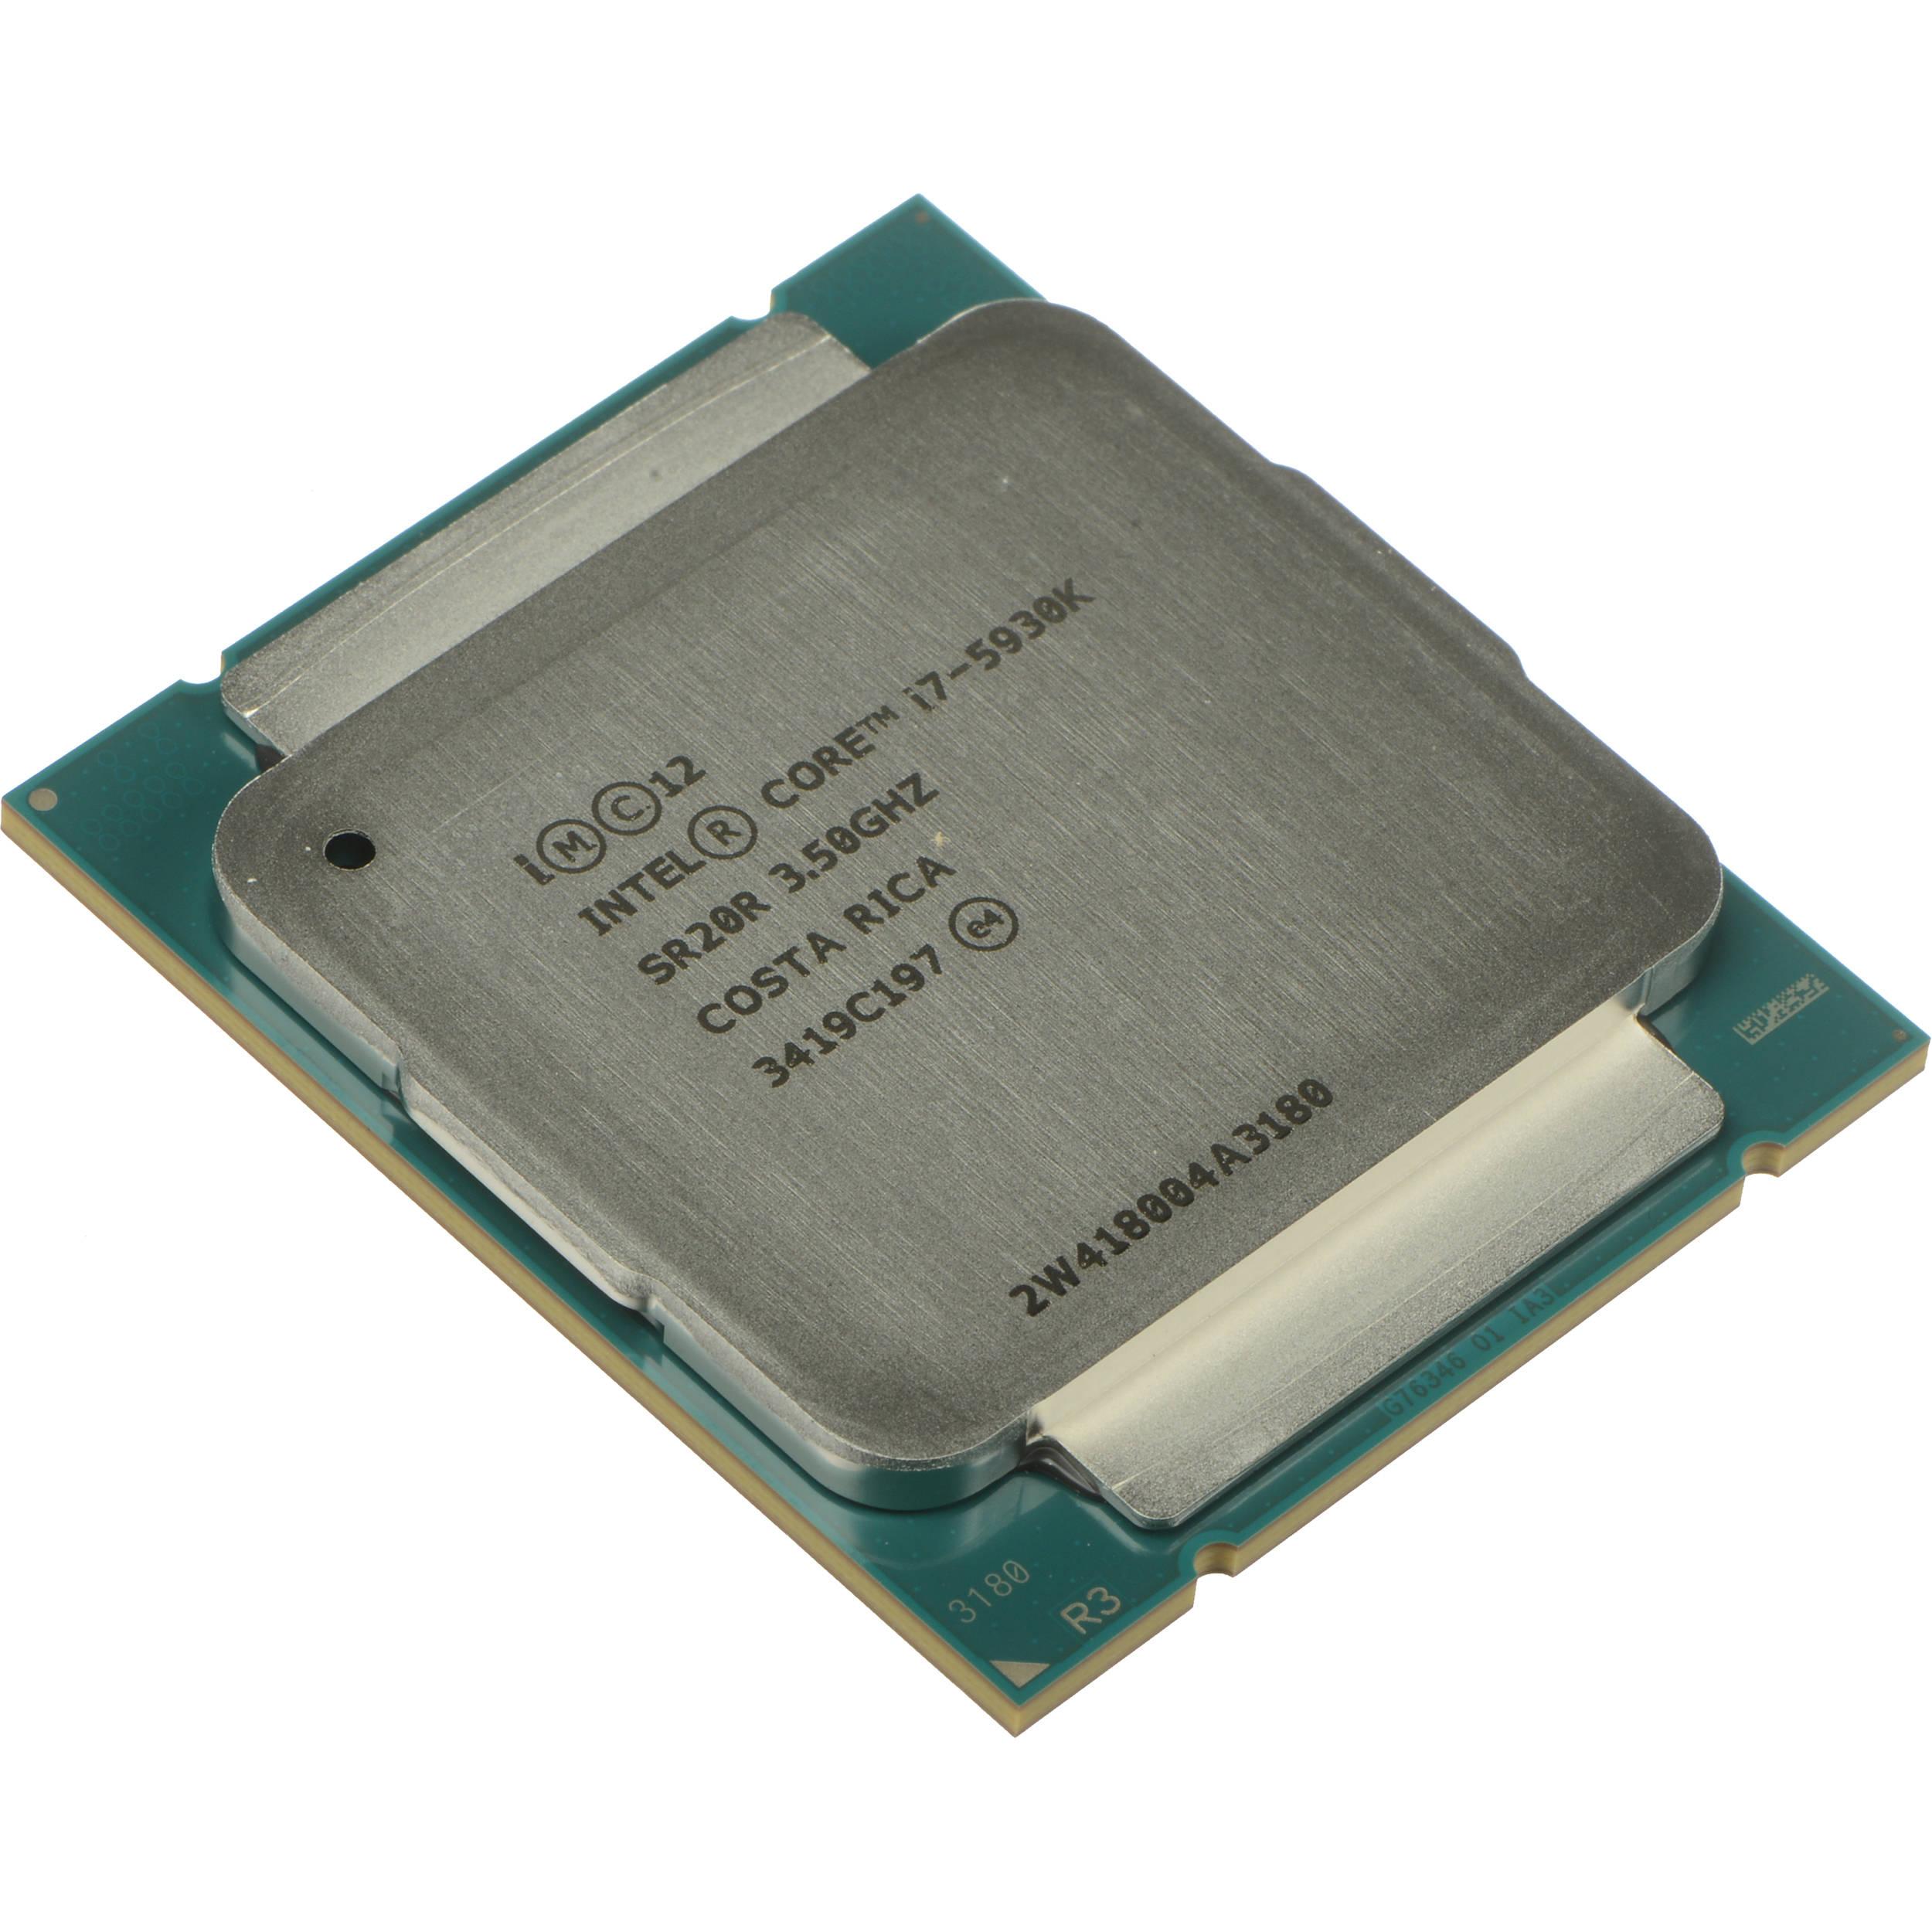 Intel Core i7-5930K 3.5 GHz Processor BX80648I75930K B&H Photo